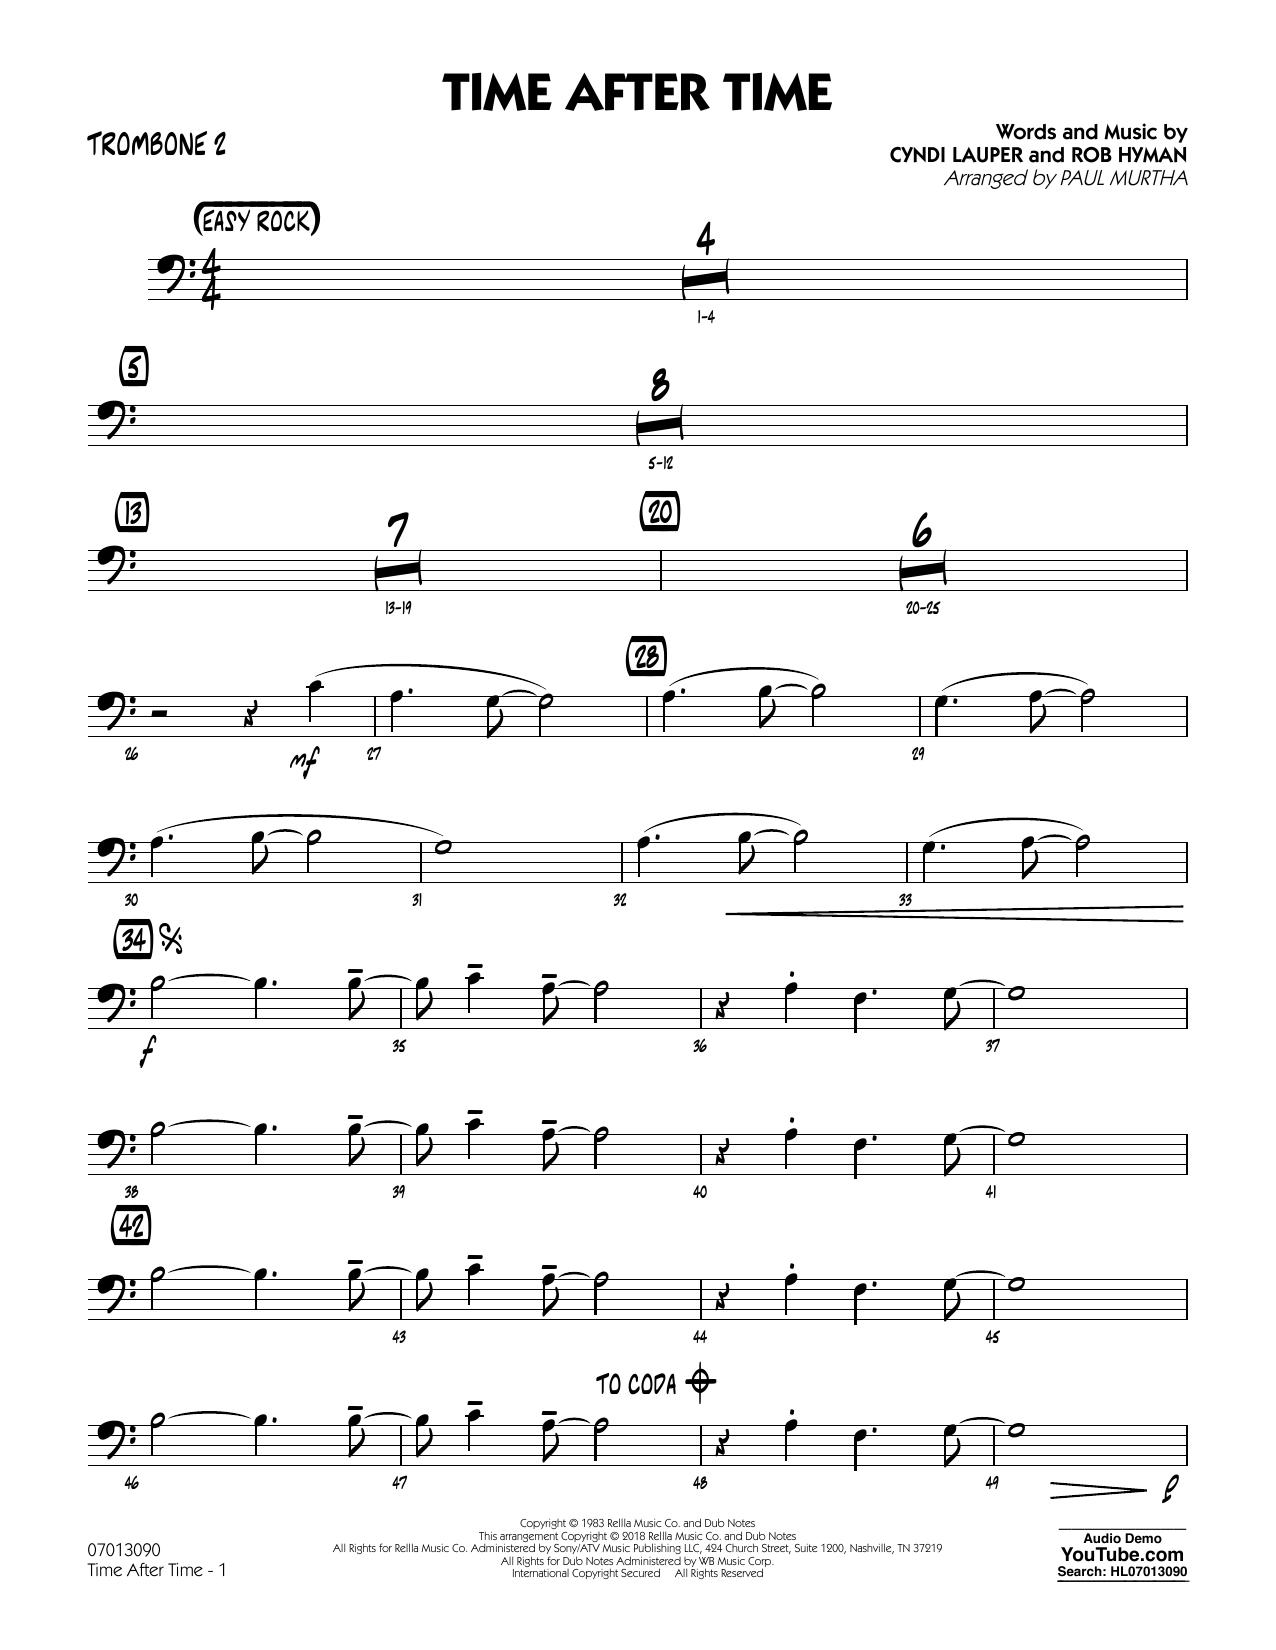 Paul Murtha 'Time After Time - Trombone 2' Sheet Music Notes, Chords |  Download Printable Jazz Ensemble - SKU: 376113